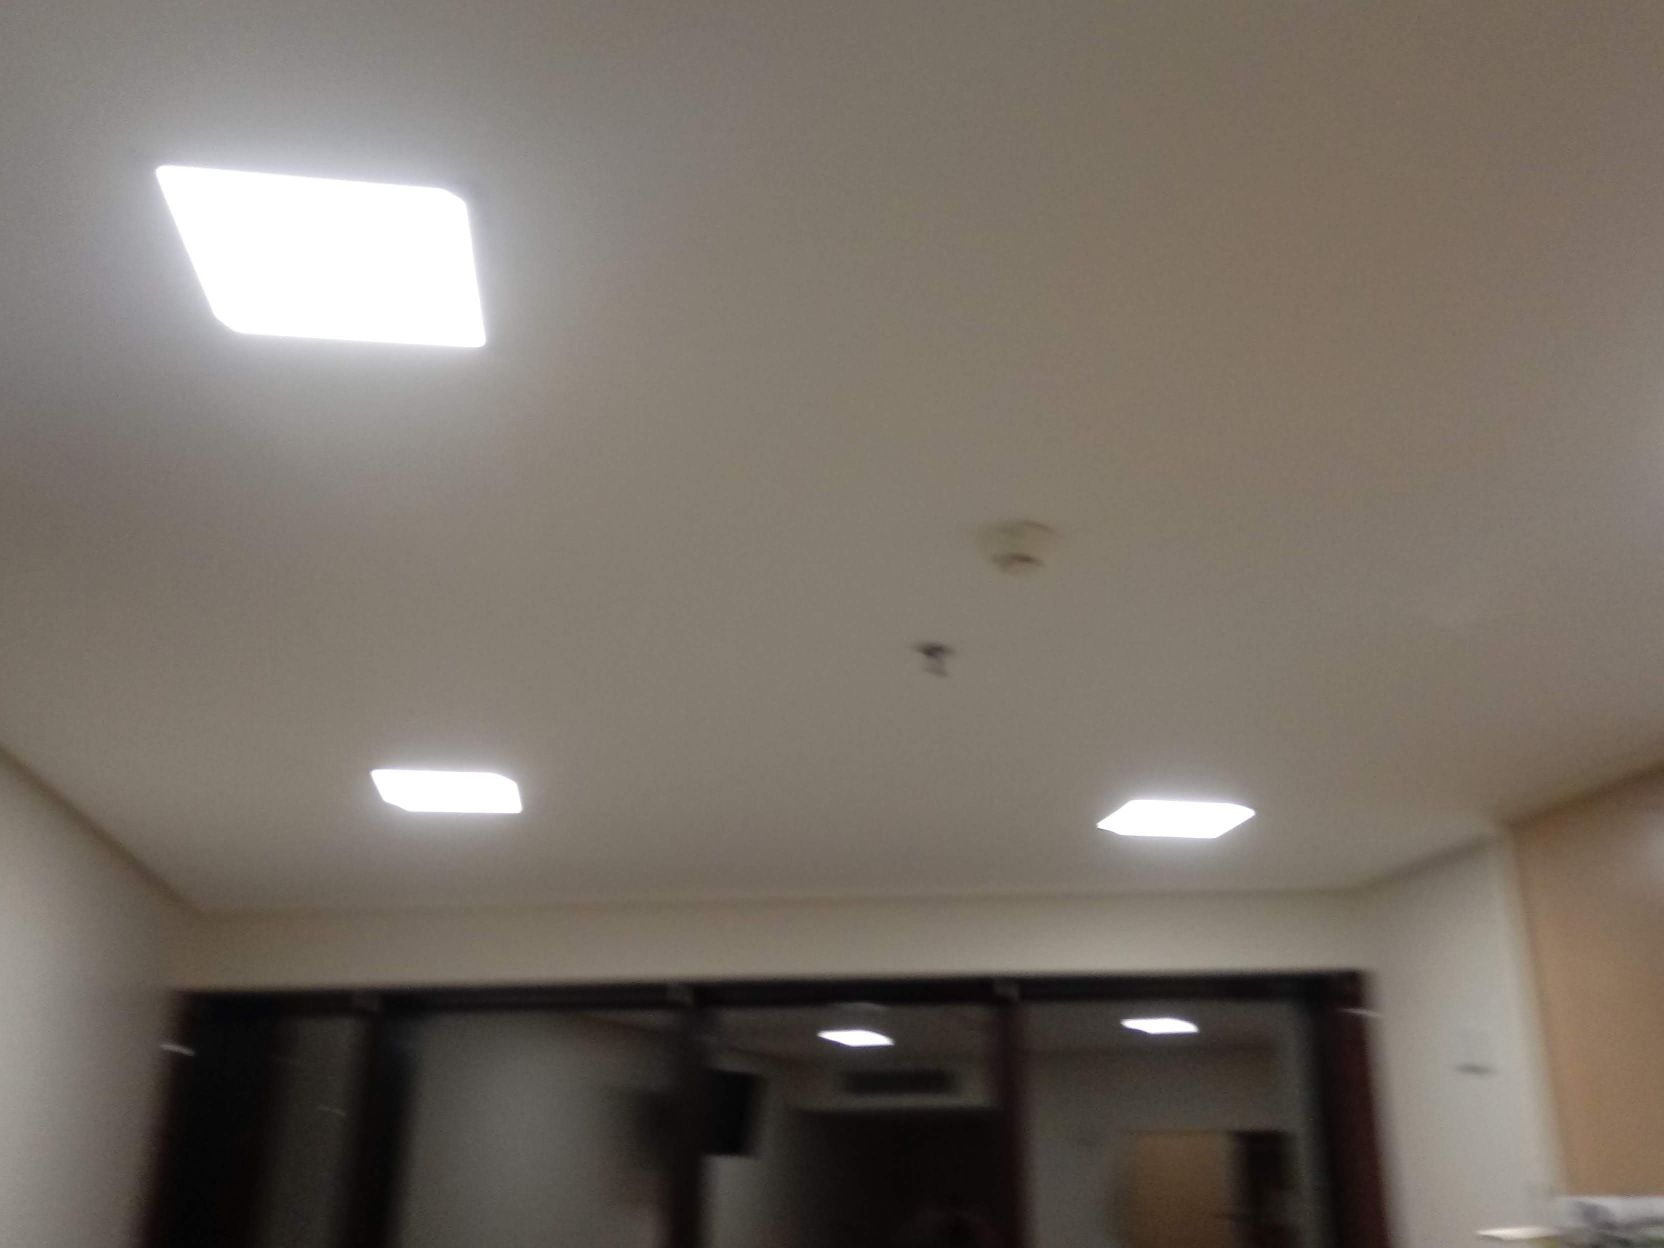 luminárias, paflons, lâmpadas....